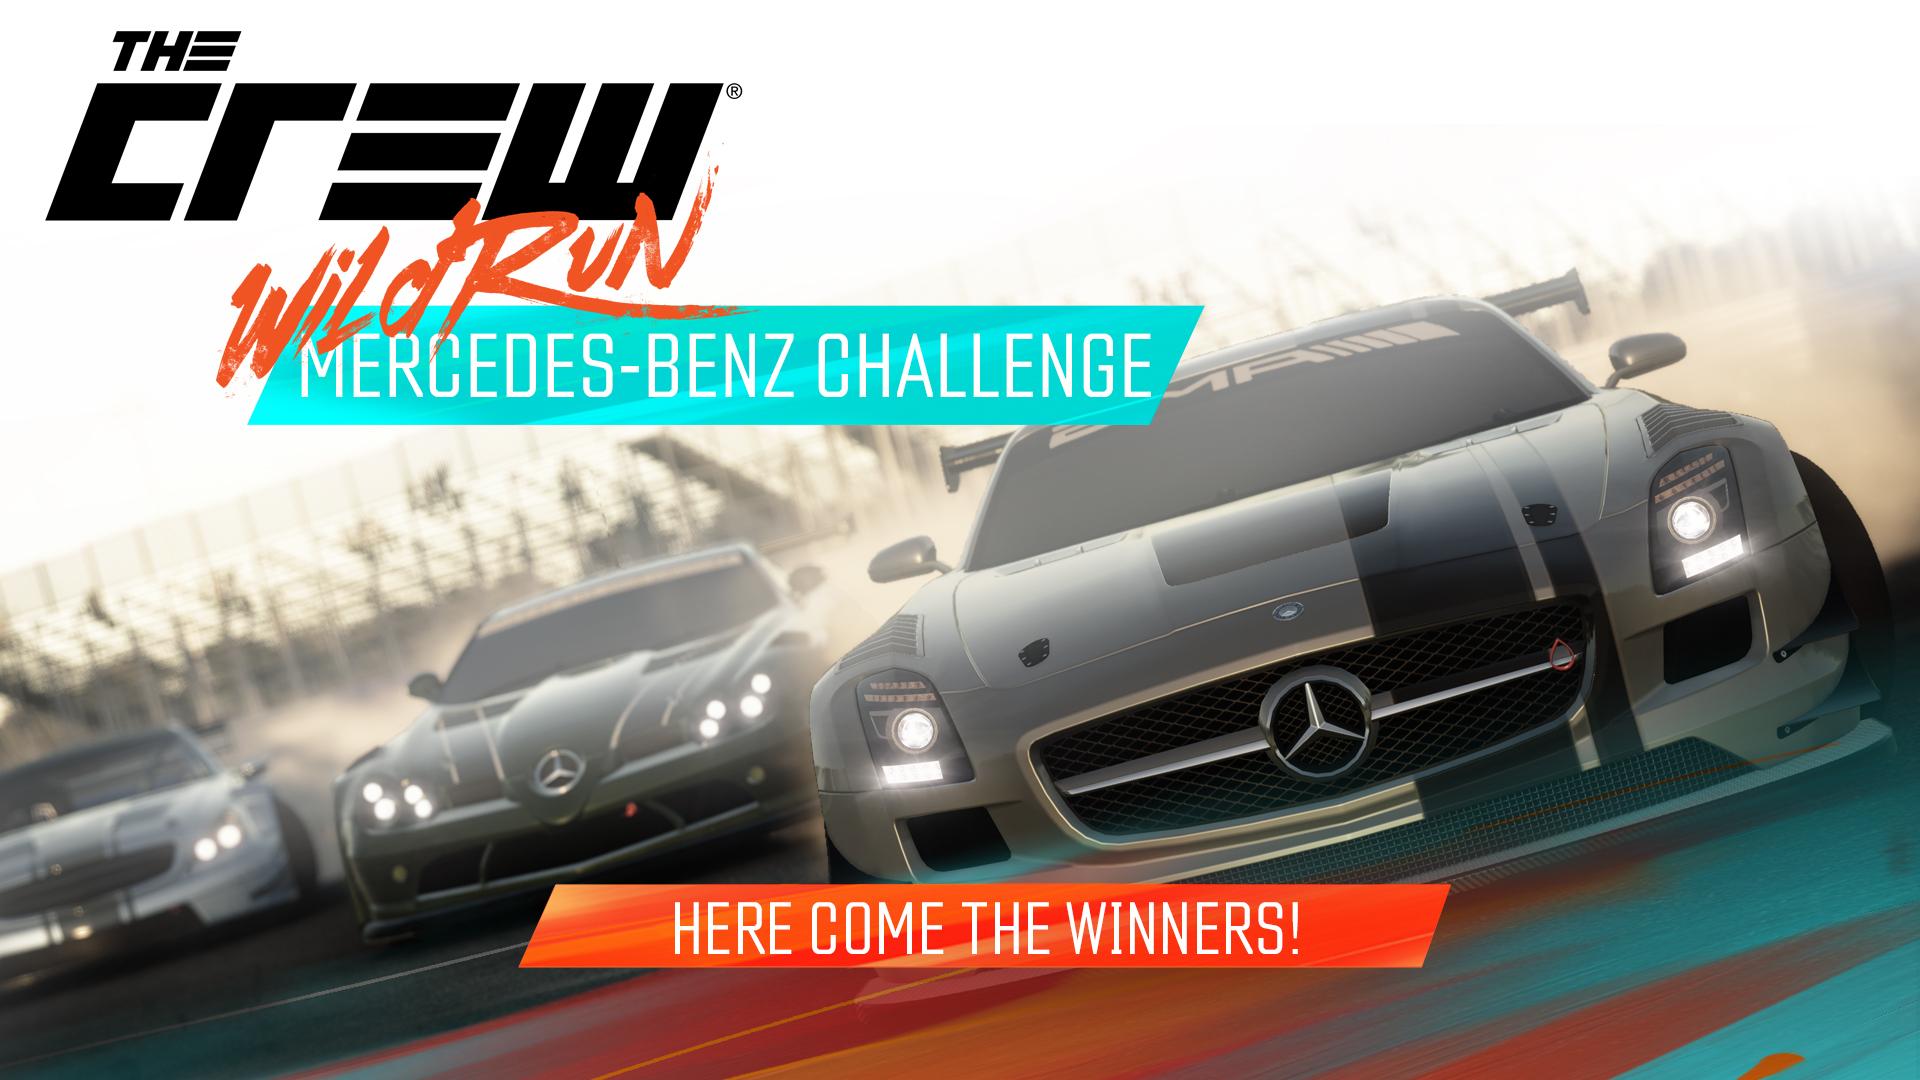 Mercedes Challenge Winners